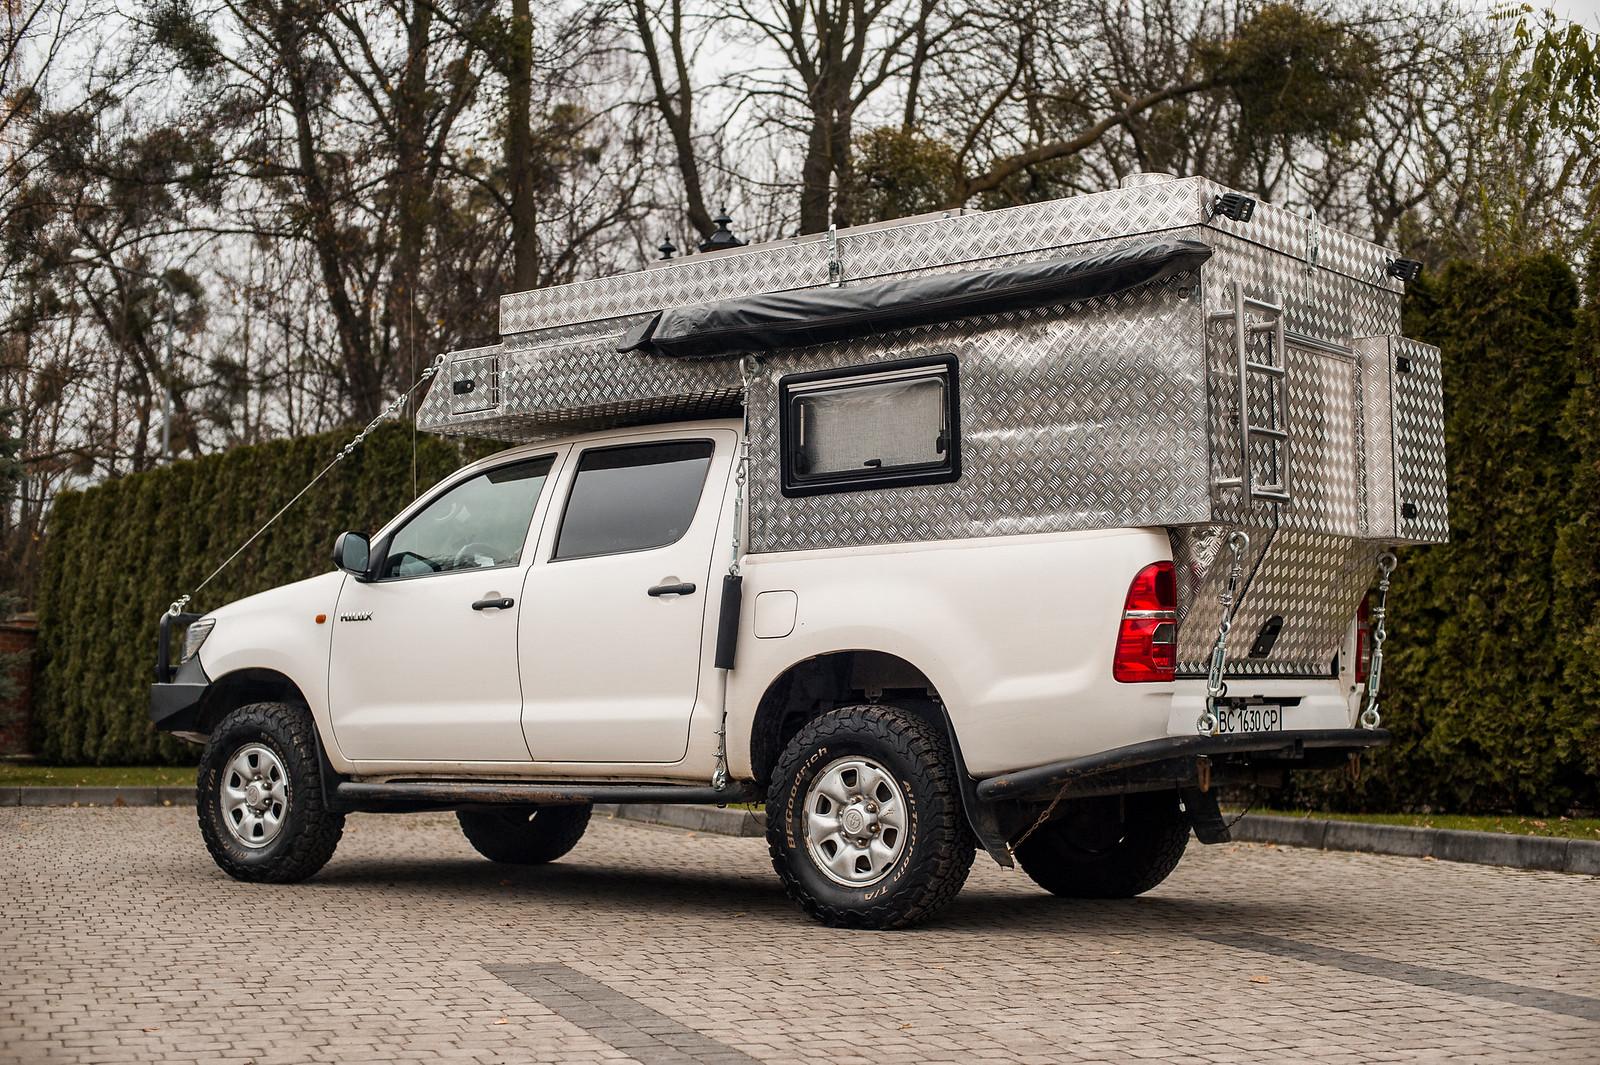 Продам Toyota Hilux Off-Road Camper 38746647321_cc10cbf7a5_h